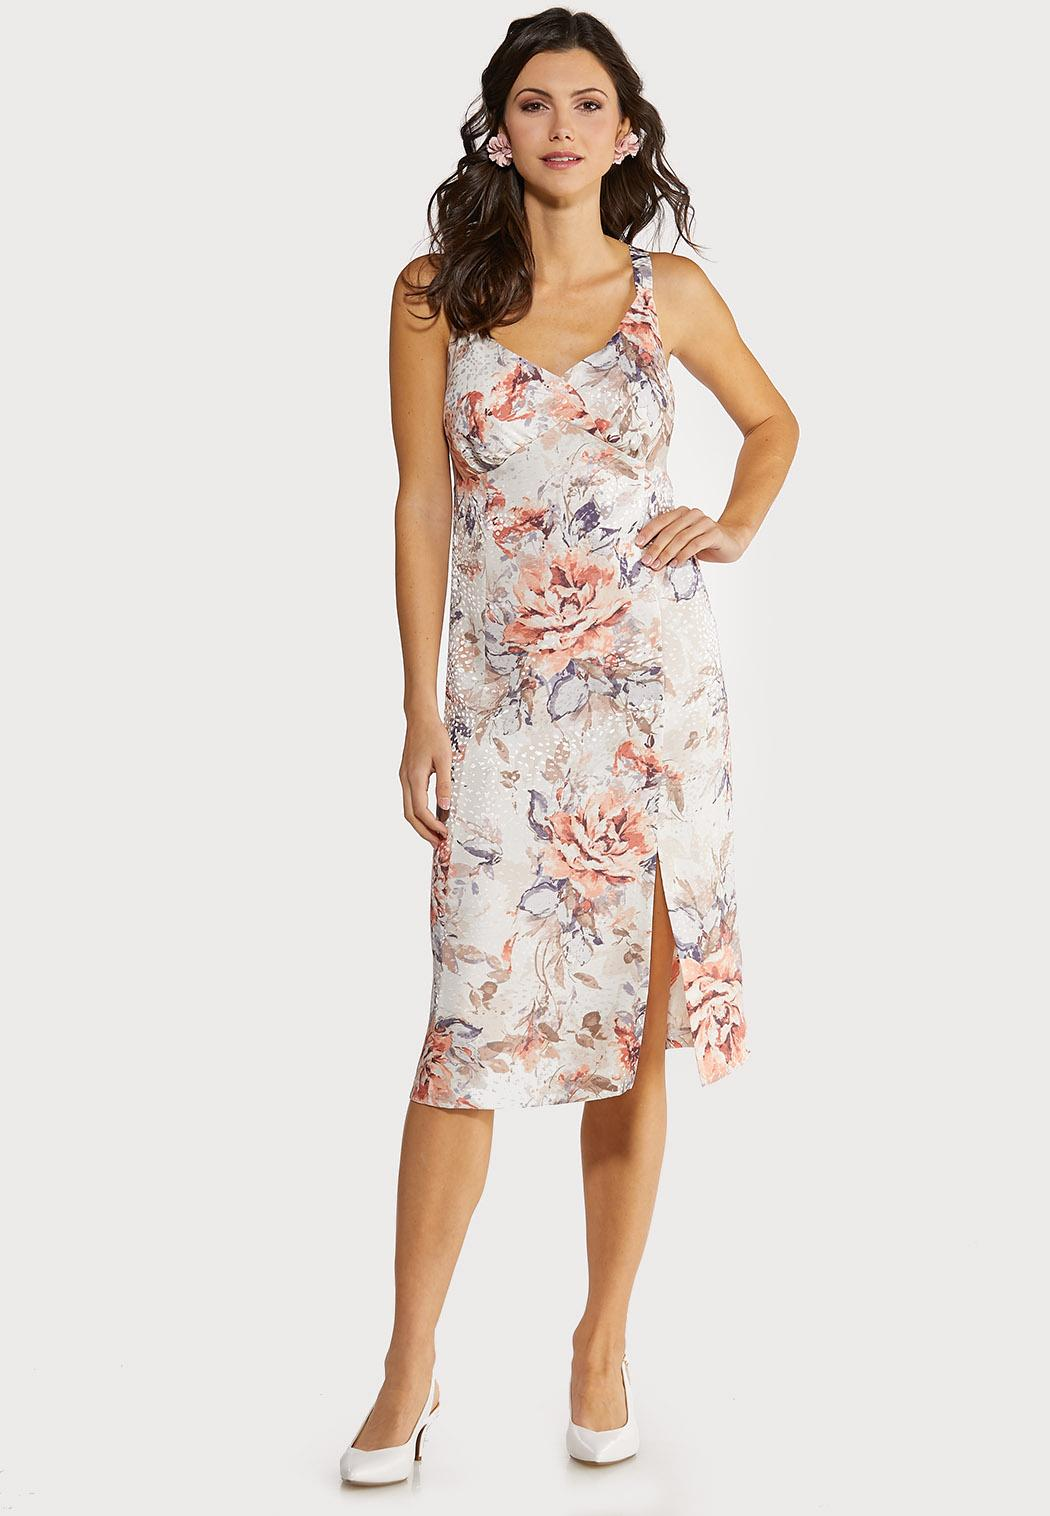 Plus Size Blush Floral Slip Dress